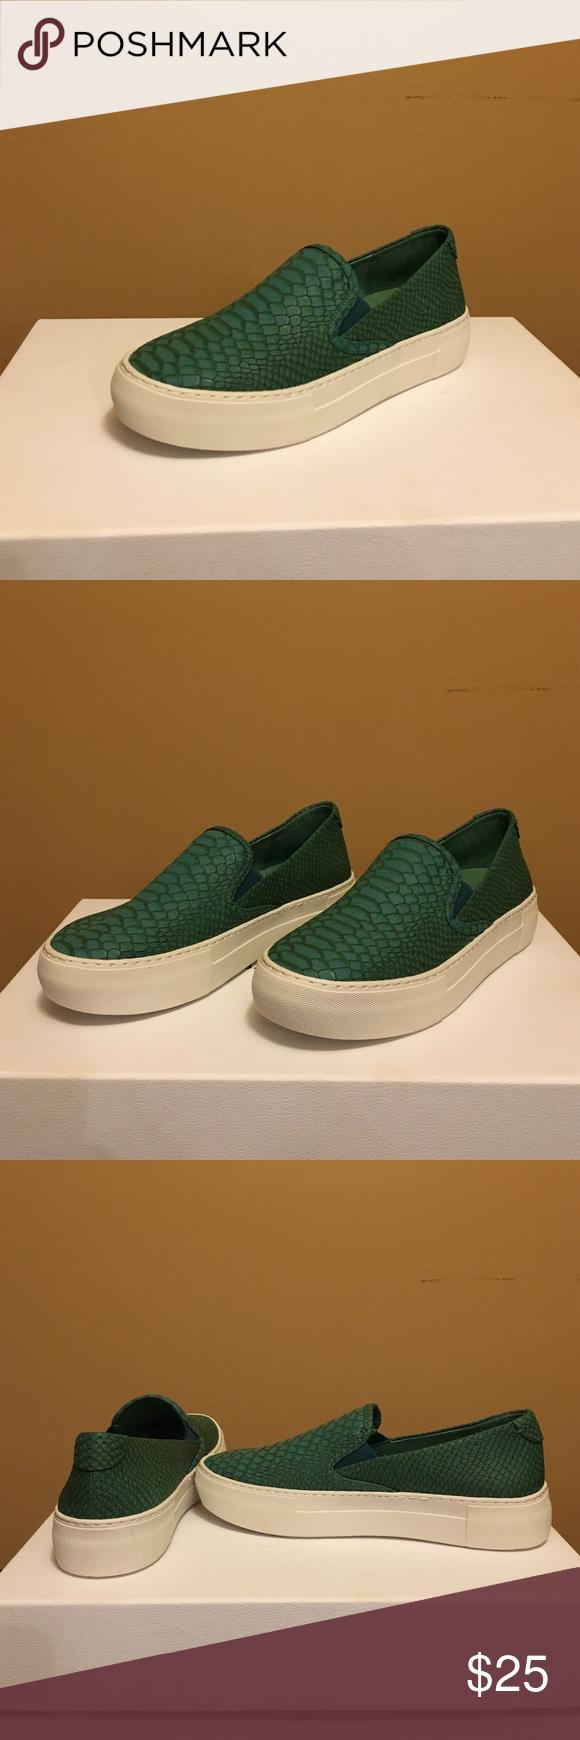 Green Snake Sneaker Green Snake Sneaker. Size 6. Worn once. J Slides Shoes Sneakers